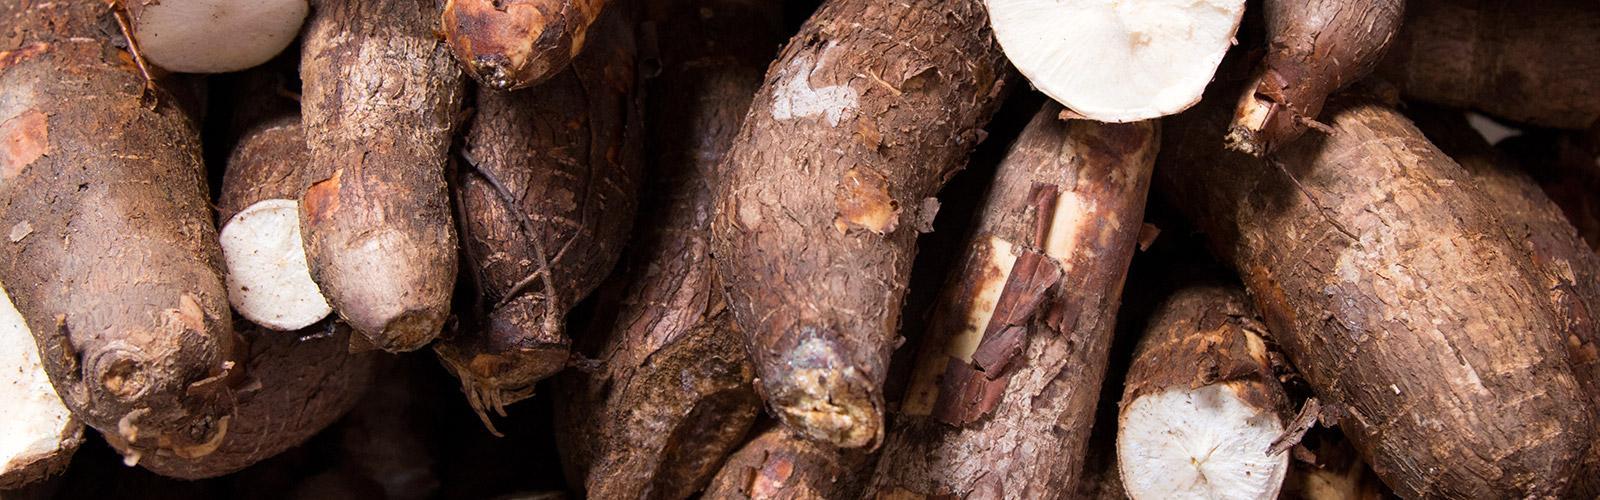 Root of Manioc  © Gustavo, Adobe Stock